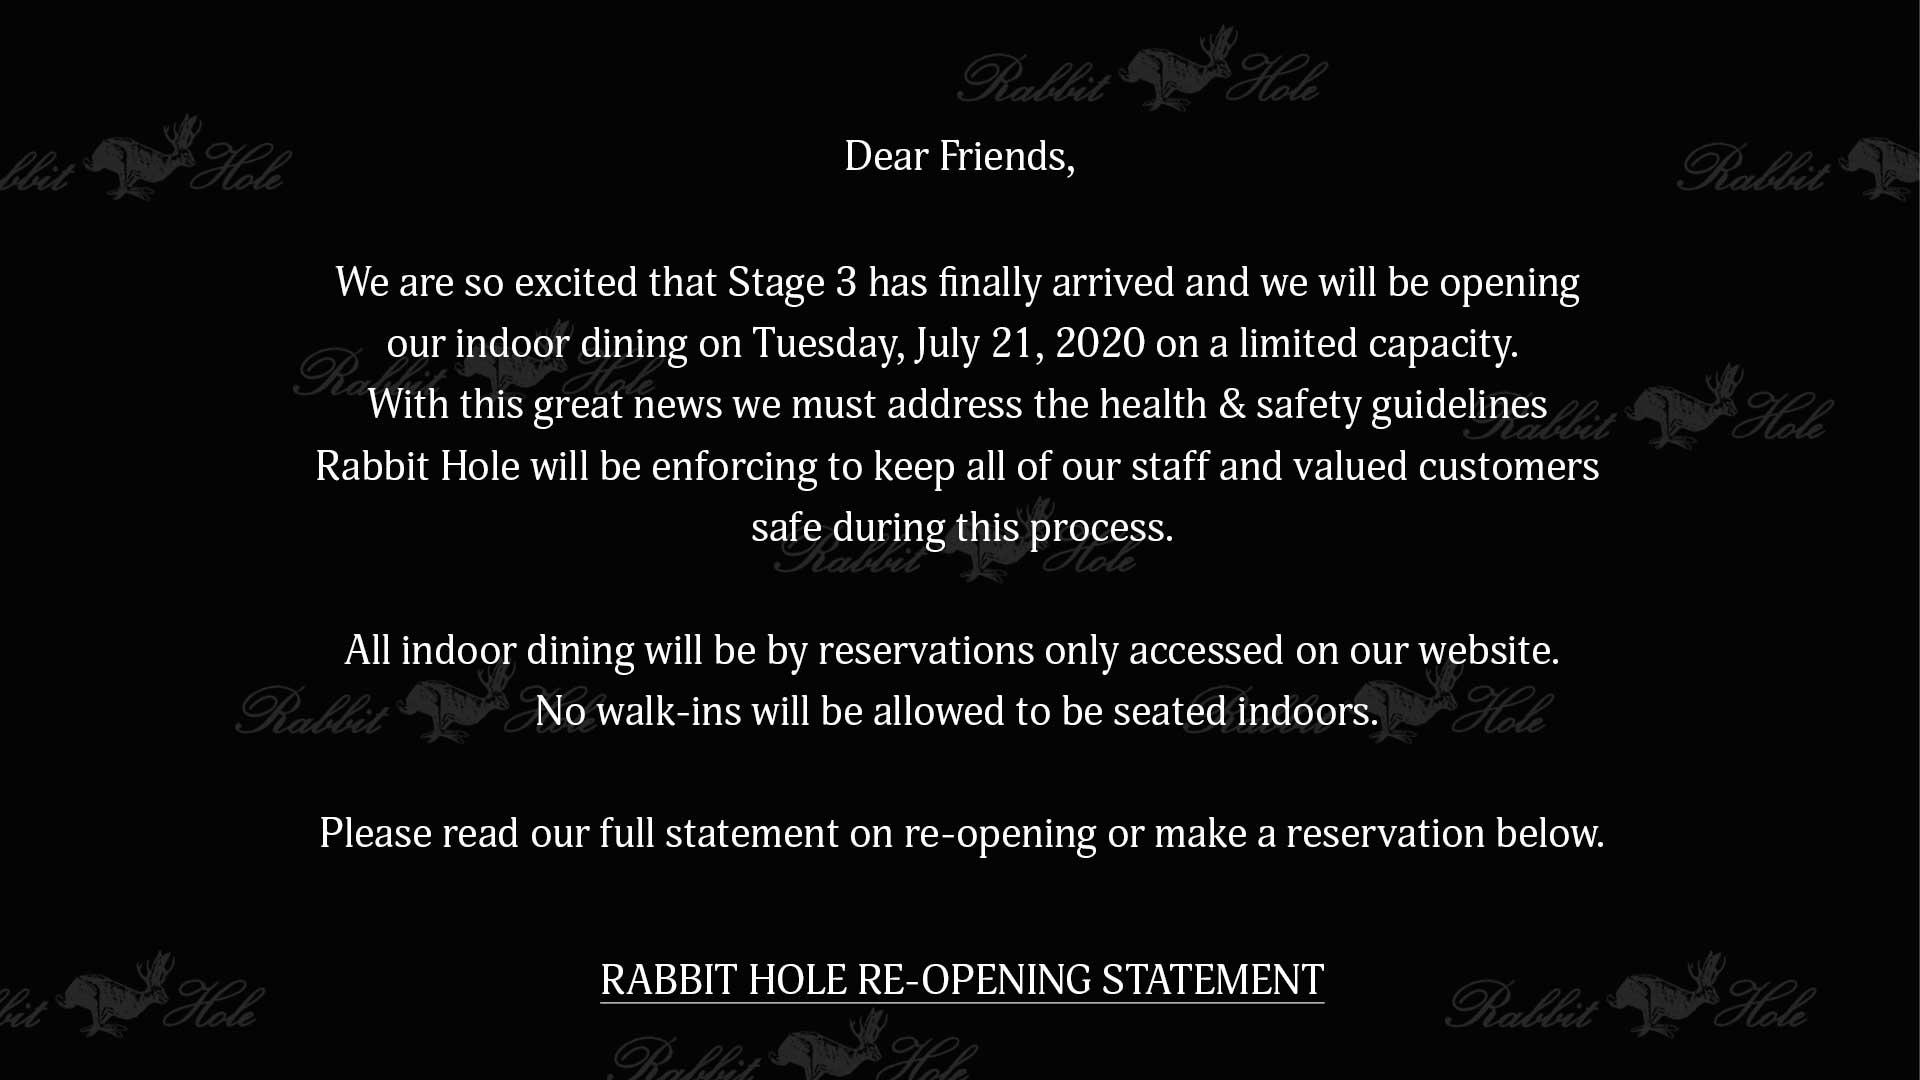 rh-re-opening